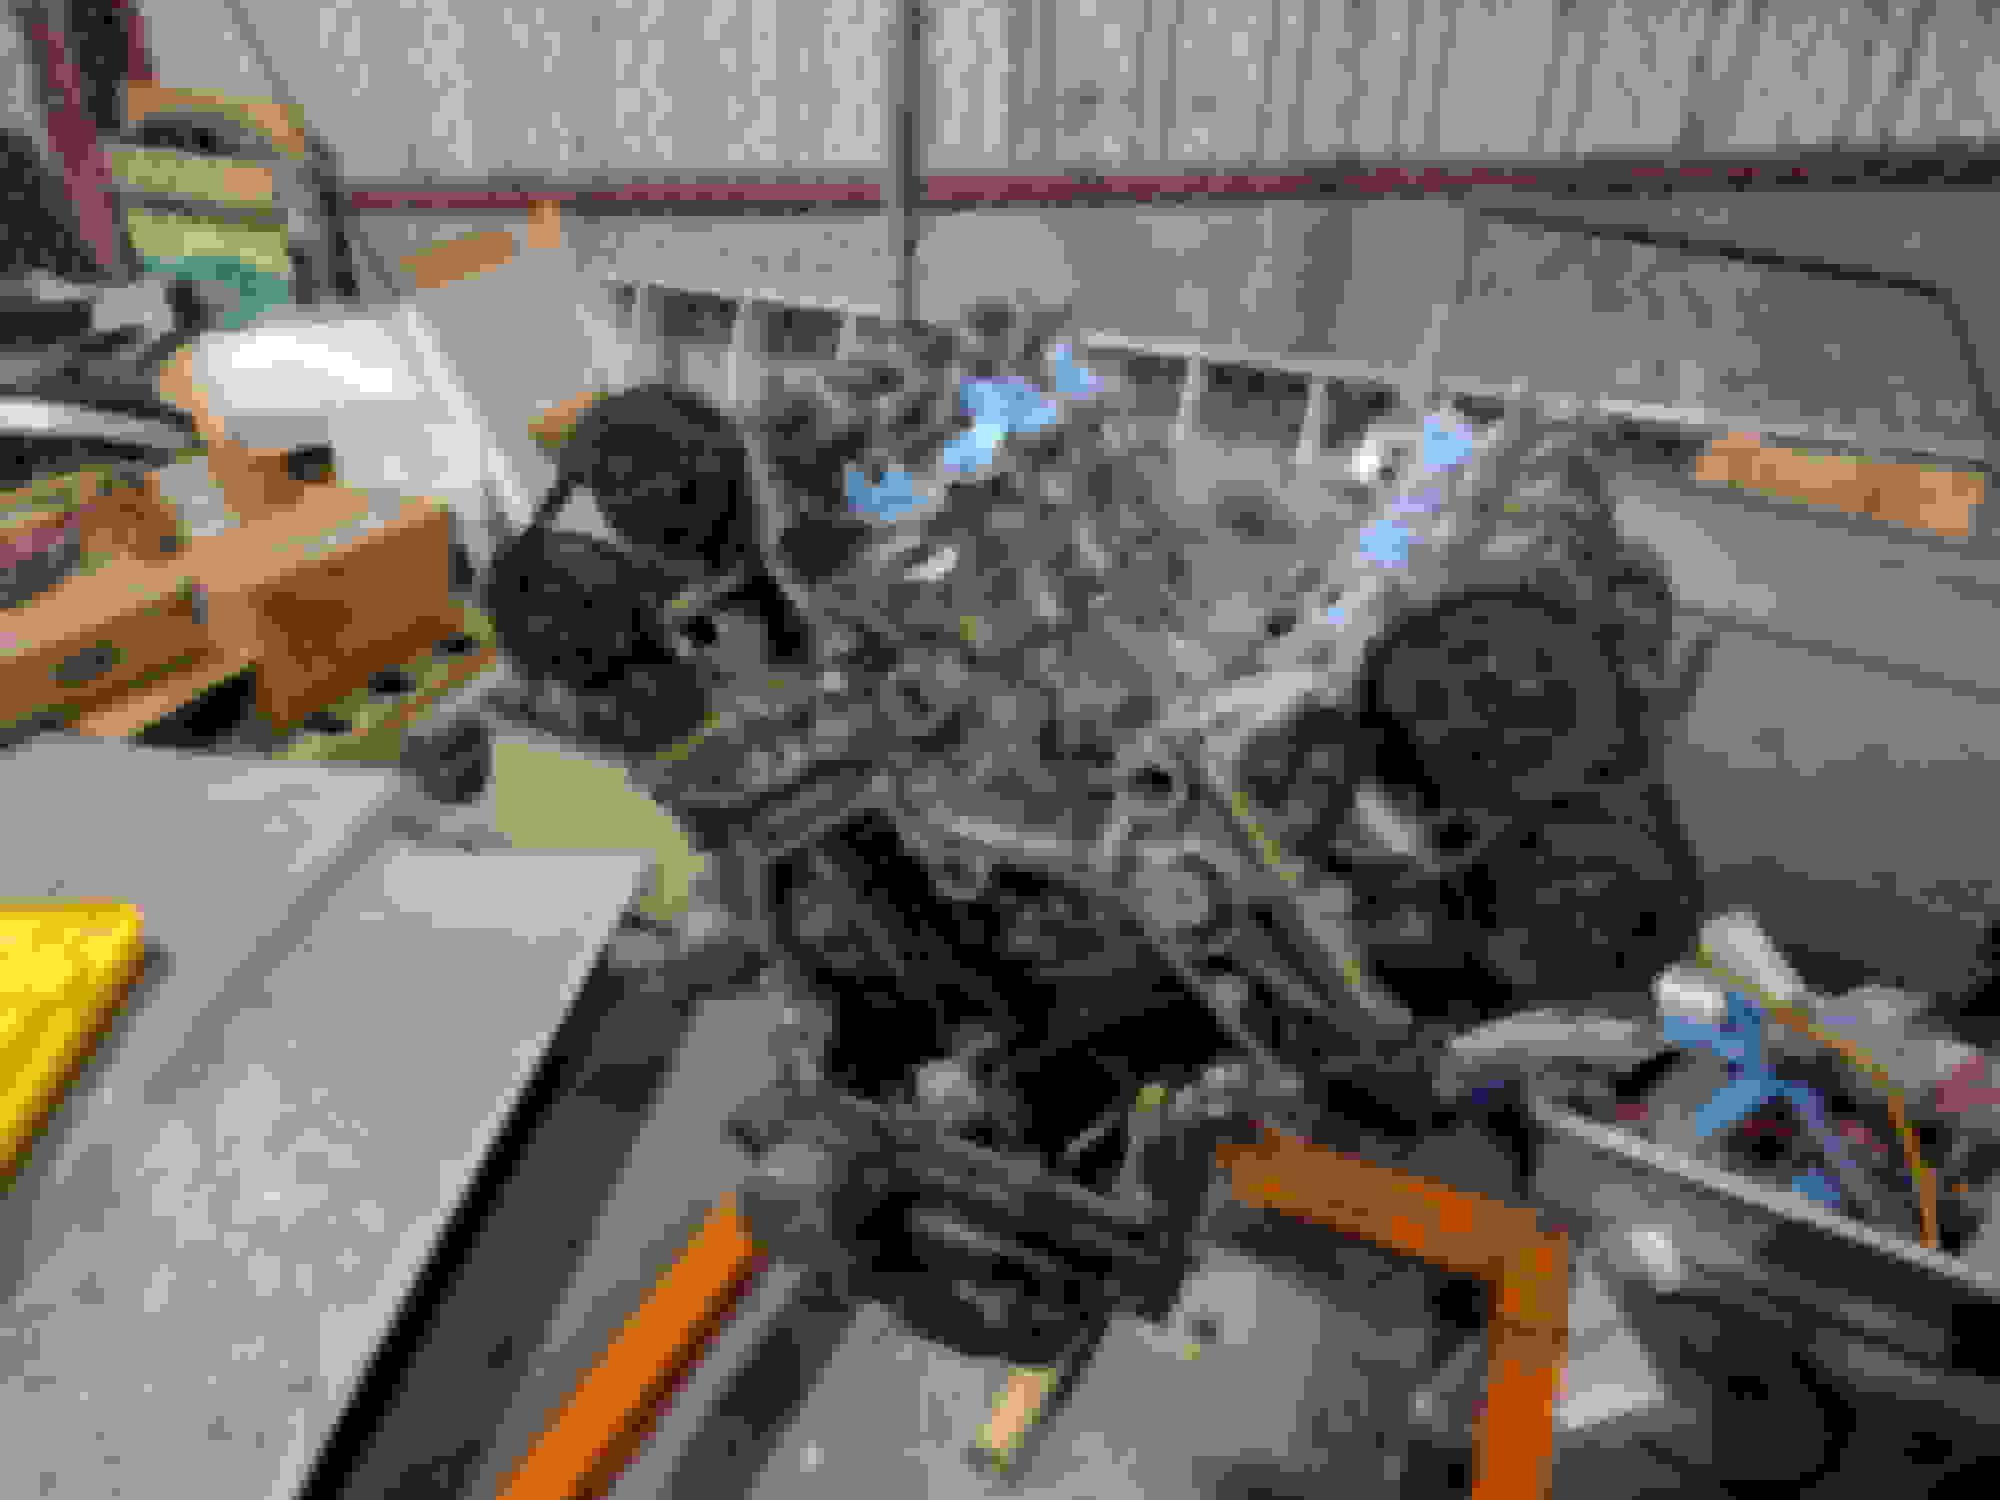 RANGE ROVER SPORT 5.0L SUPERCHARGE ENGINE PISTON RANGE ROVER 5.0L SUPERCHARGED